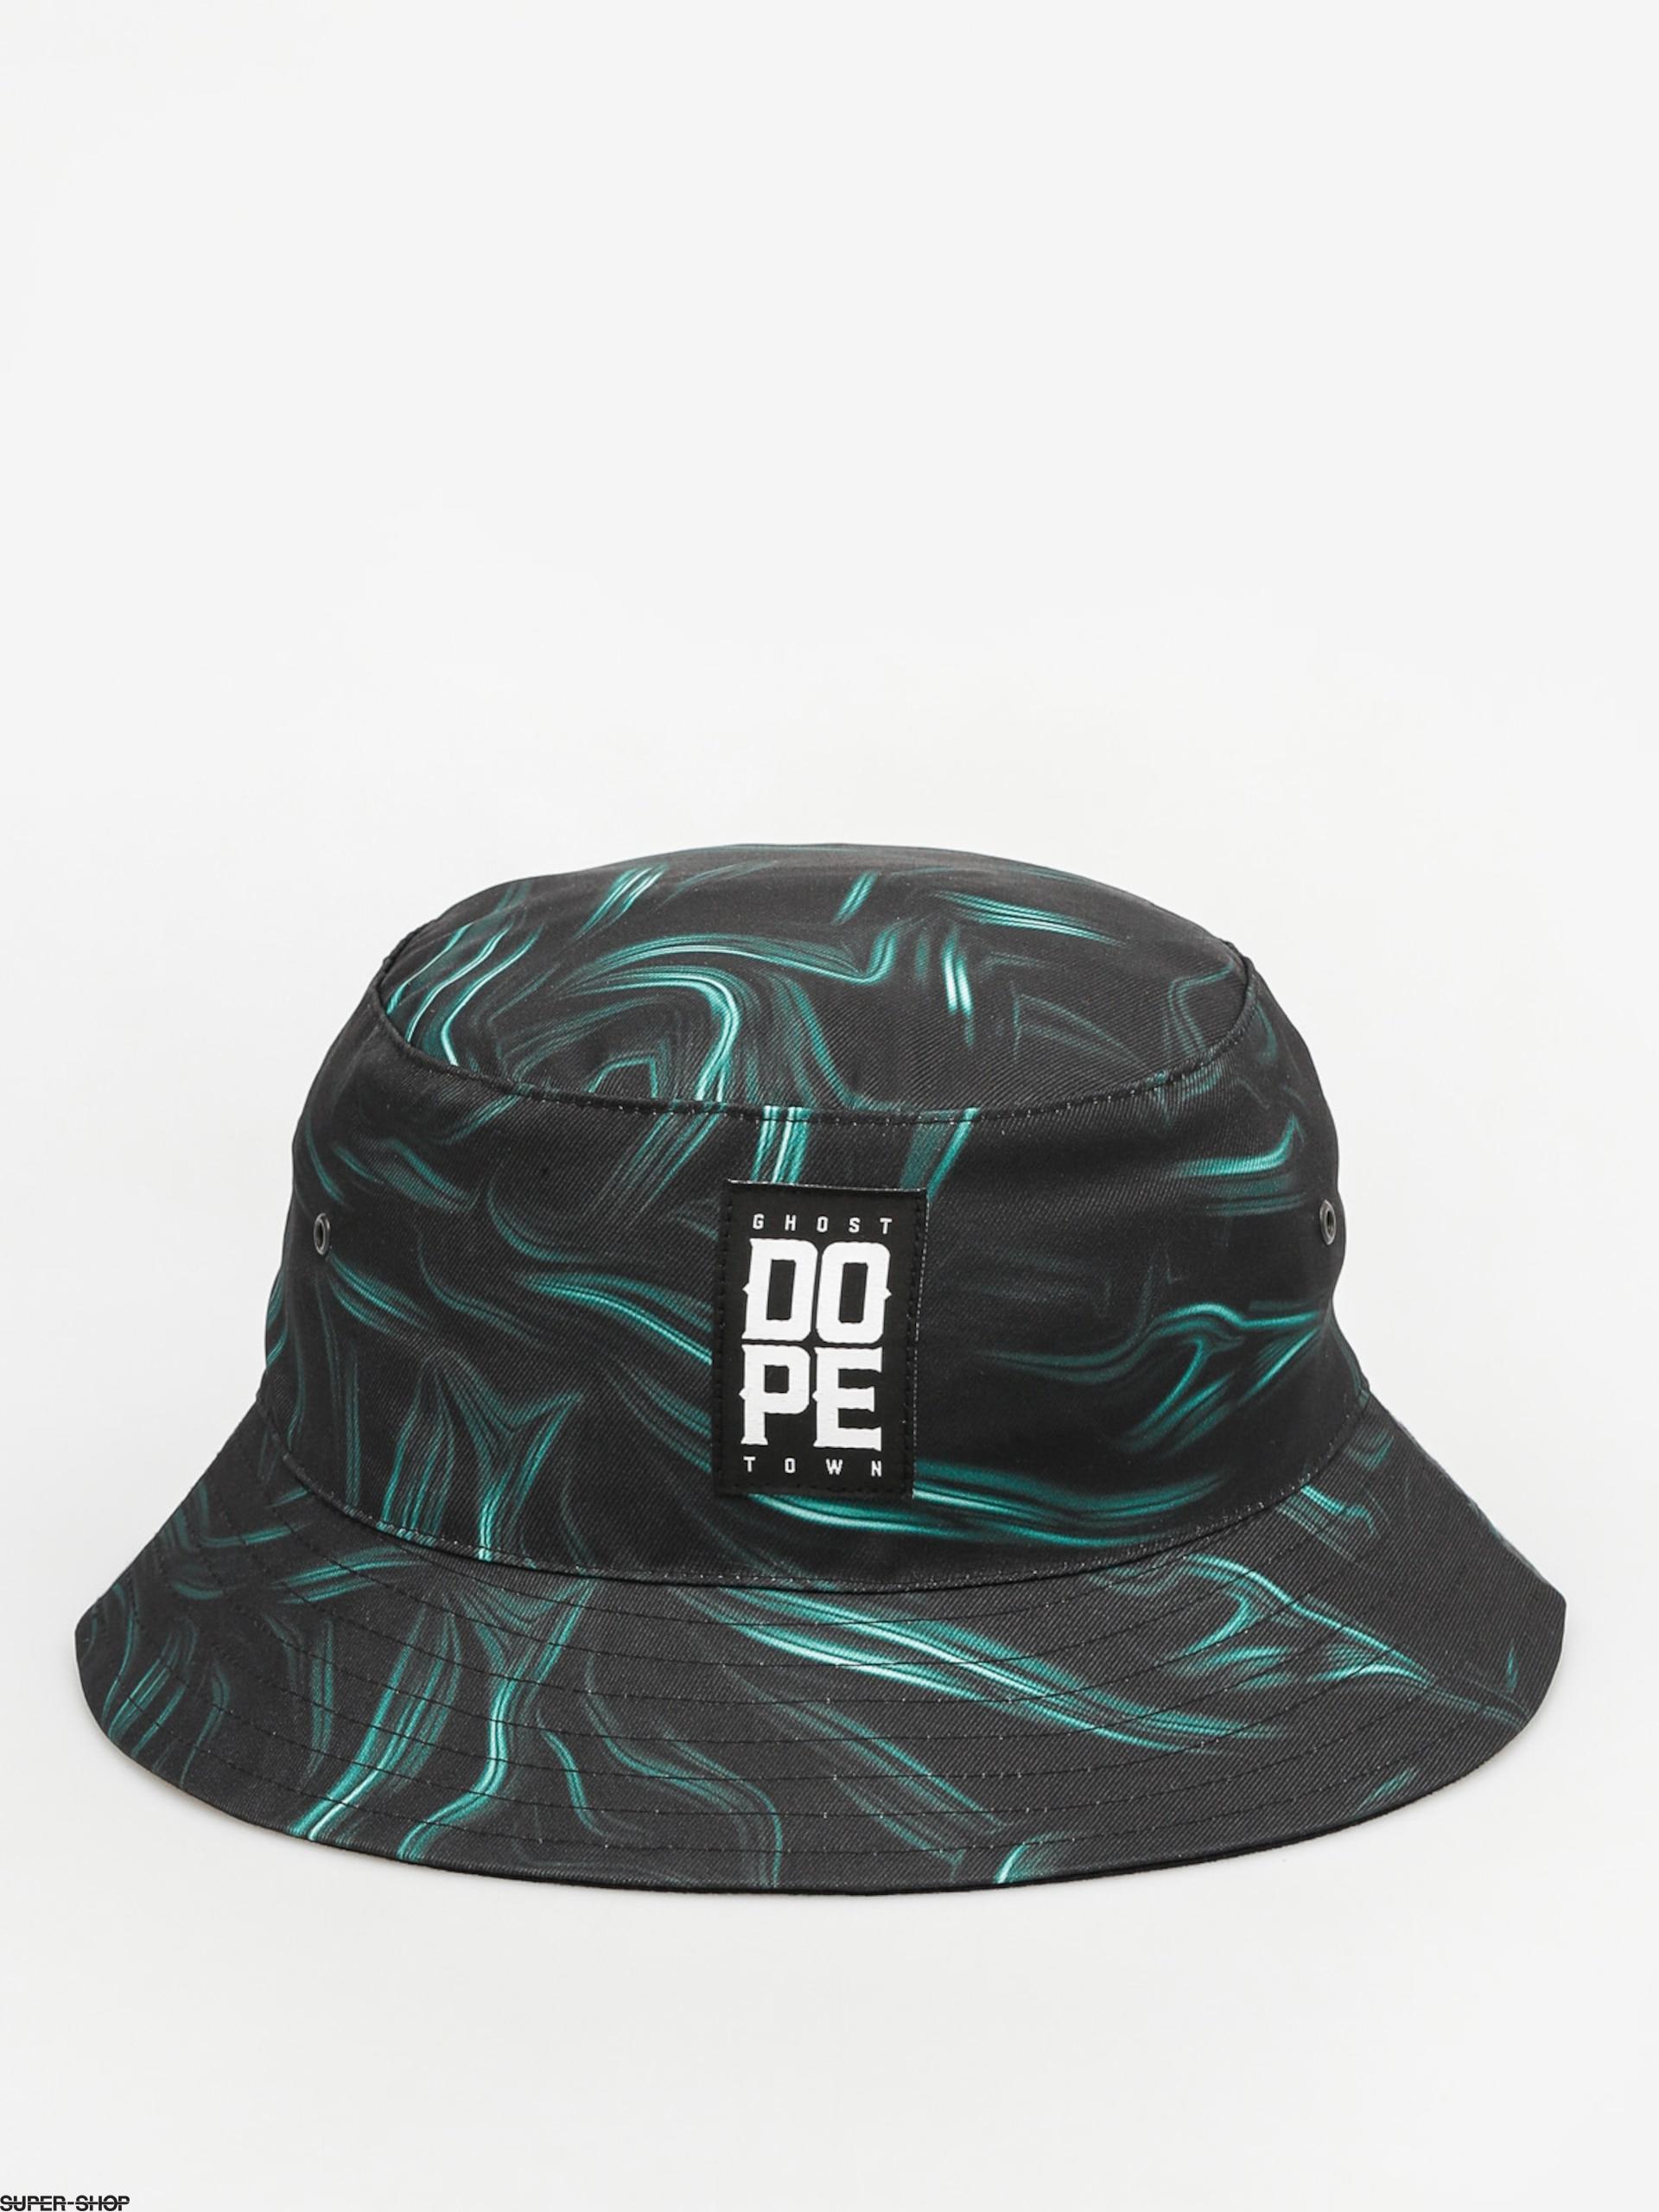 222c5eda 859769-w1920-diamante-wear-hat-ghost-town-black.jpg